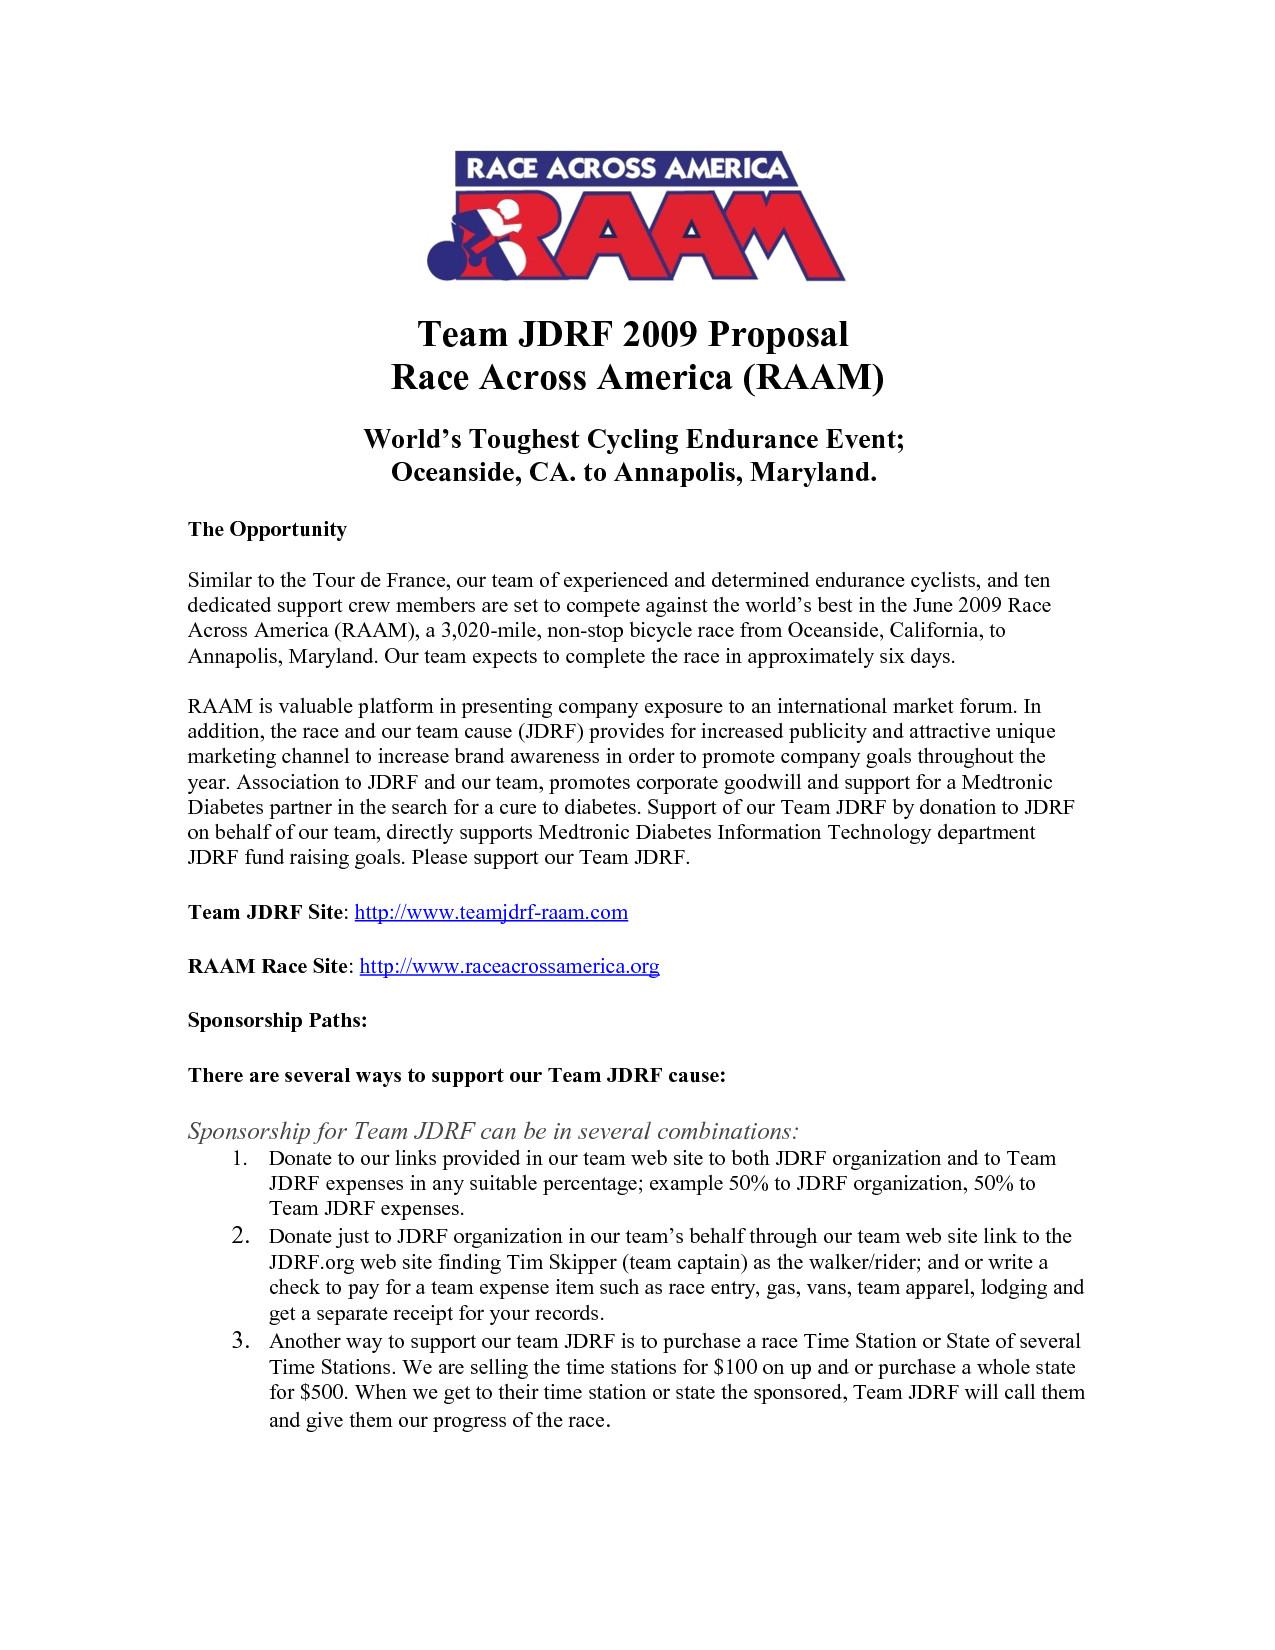 Motorsport Sponsorship Contract Template Car Racing Sponsorship Contract Template Homeworktidy X